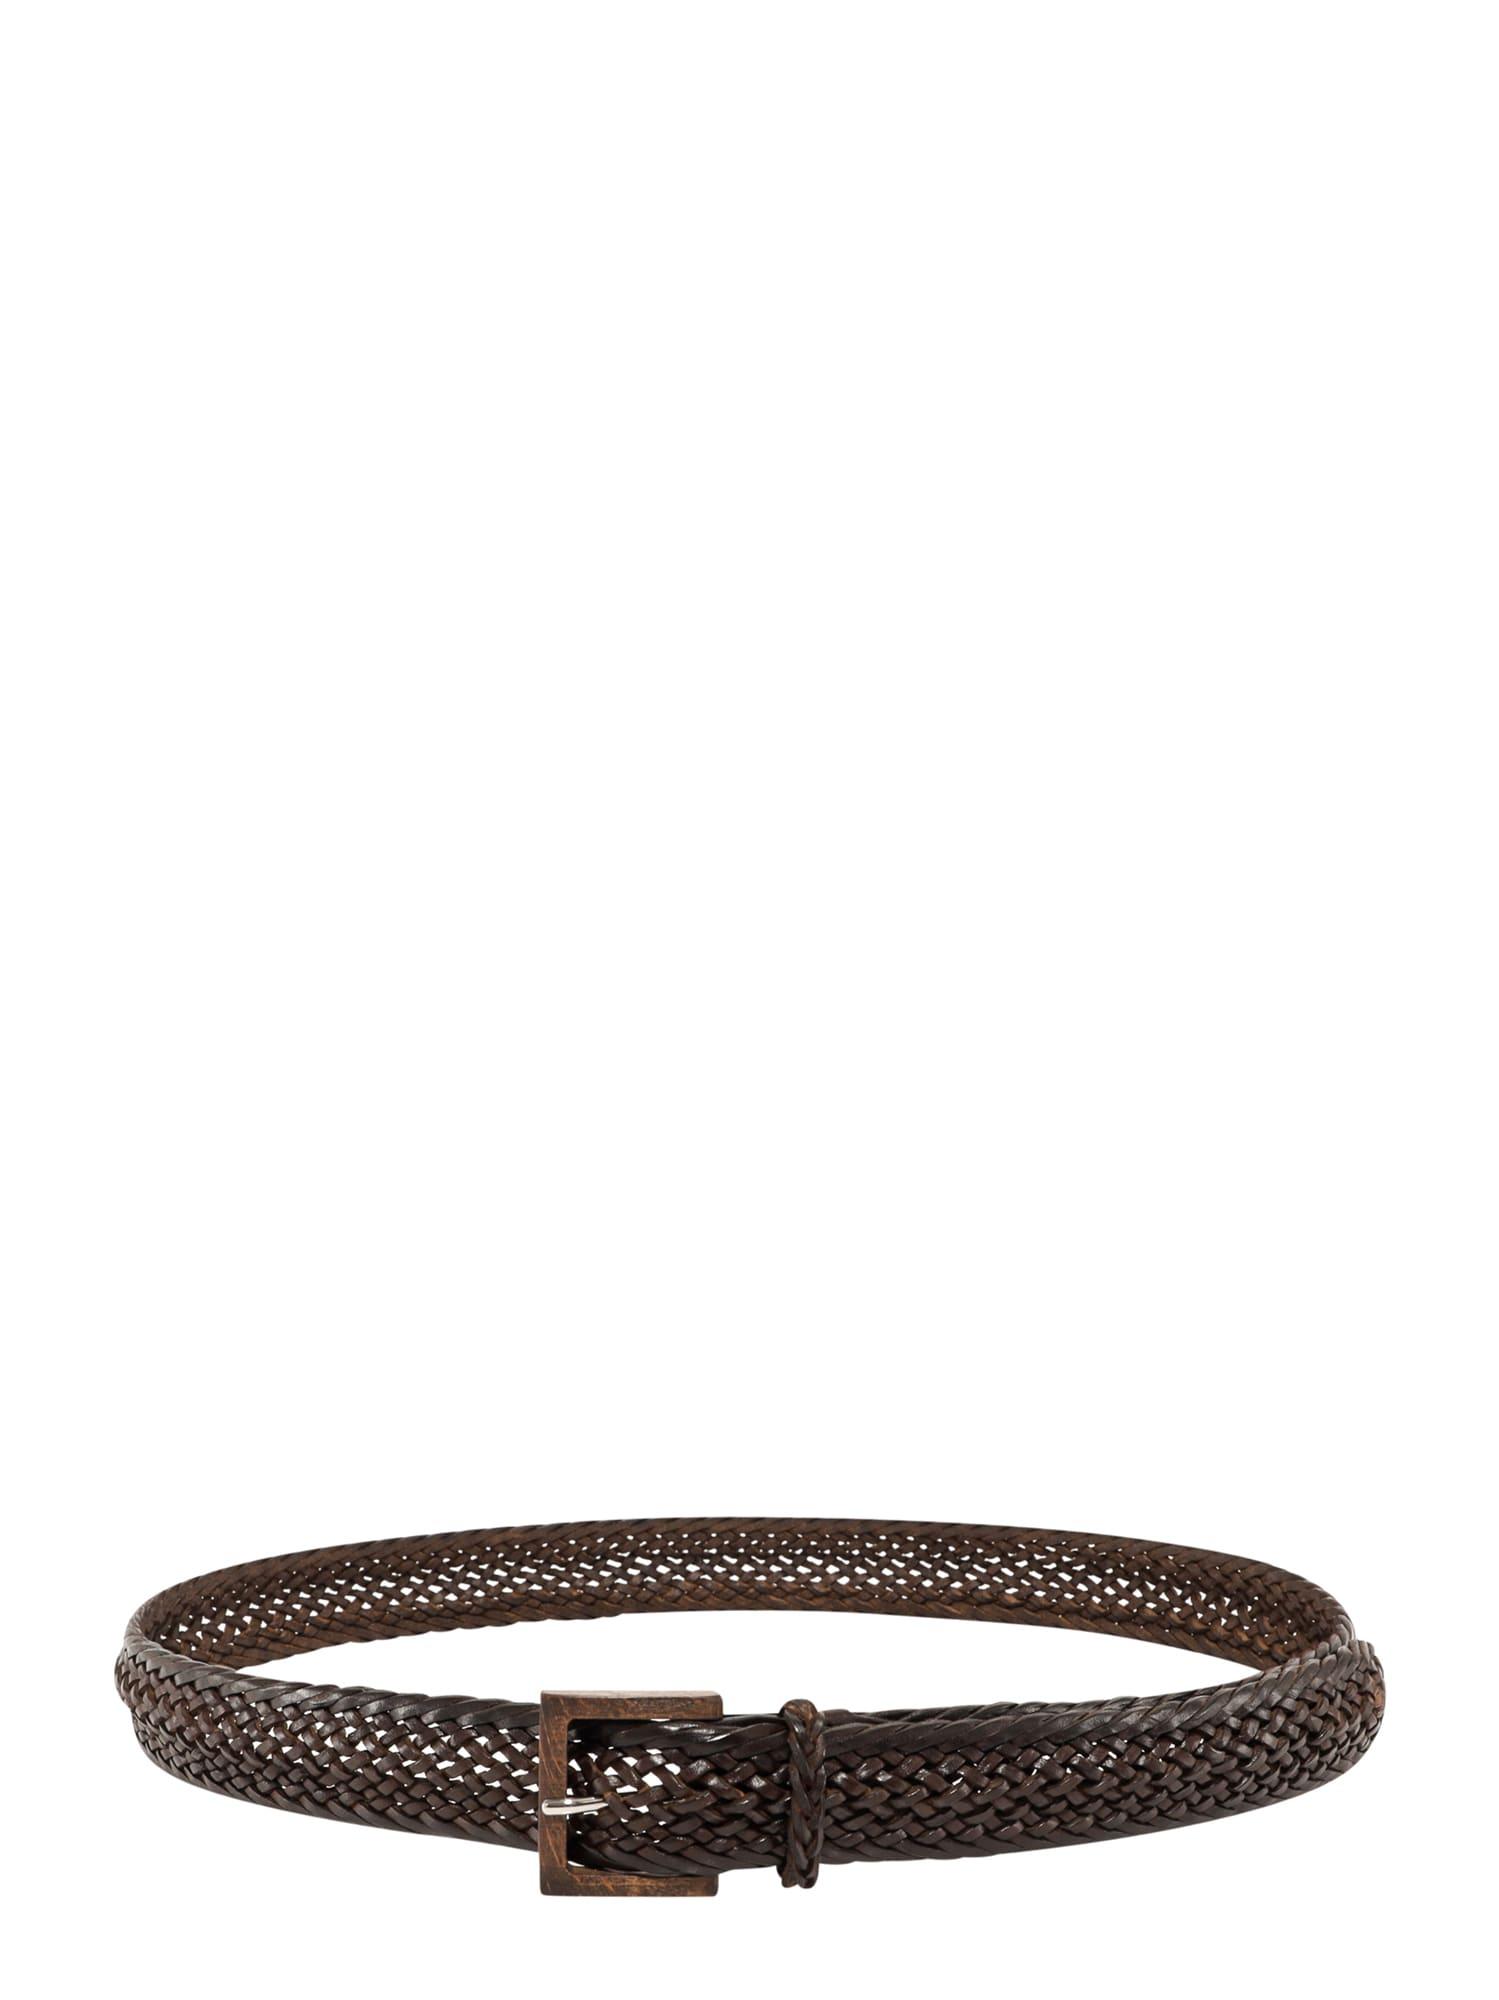 Orciani Belts BELT